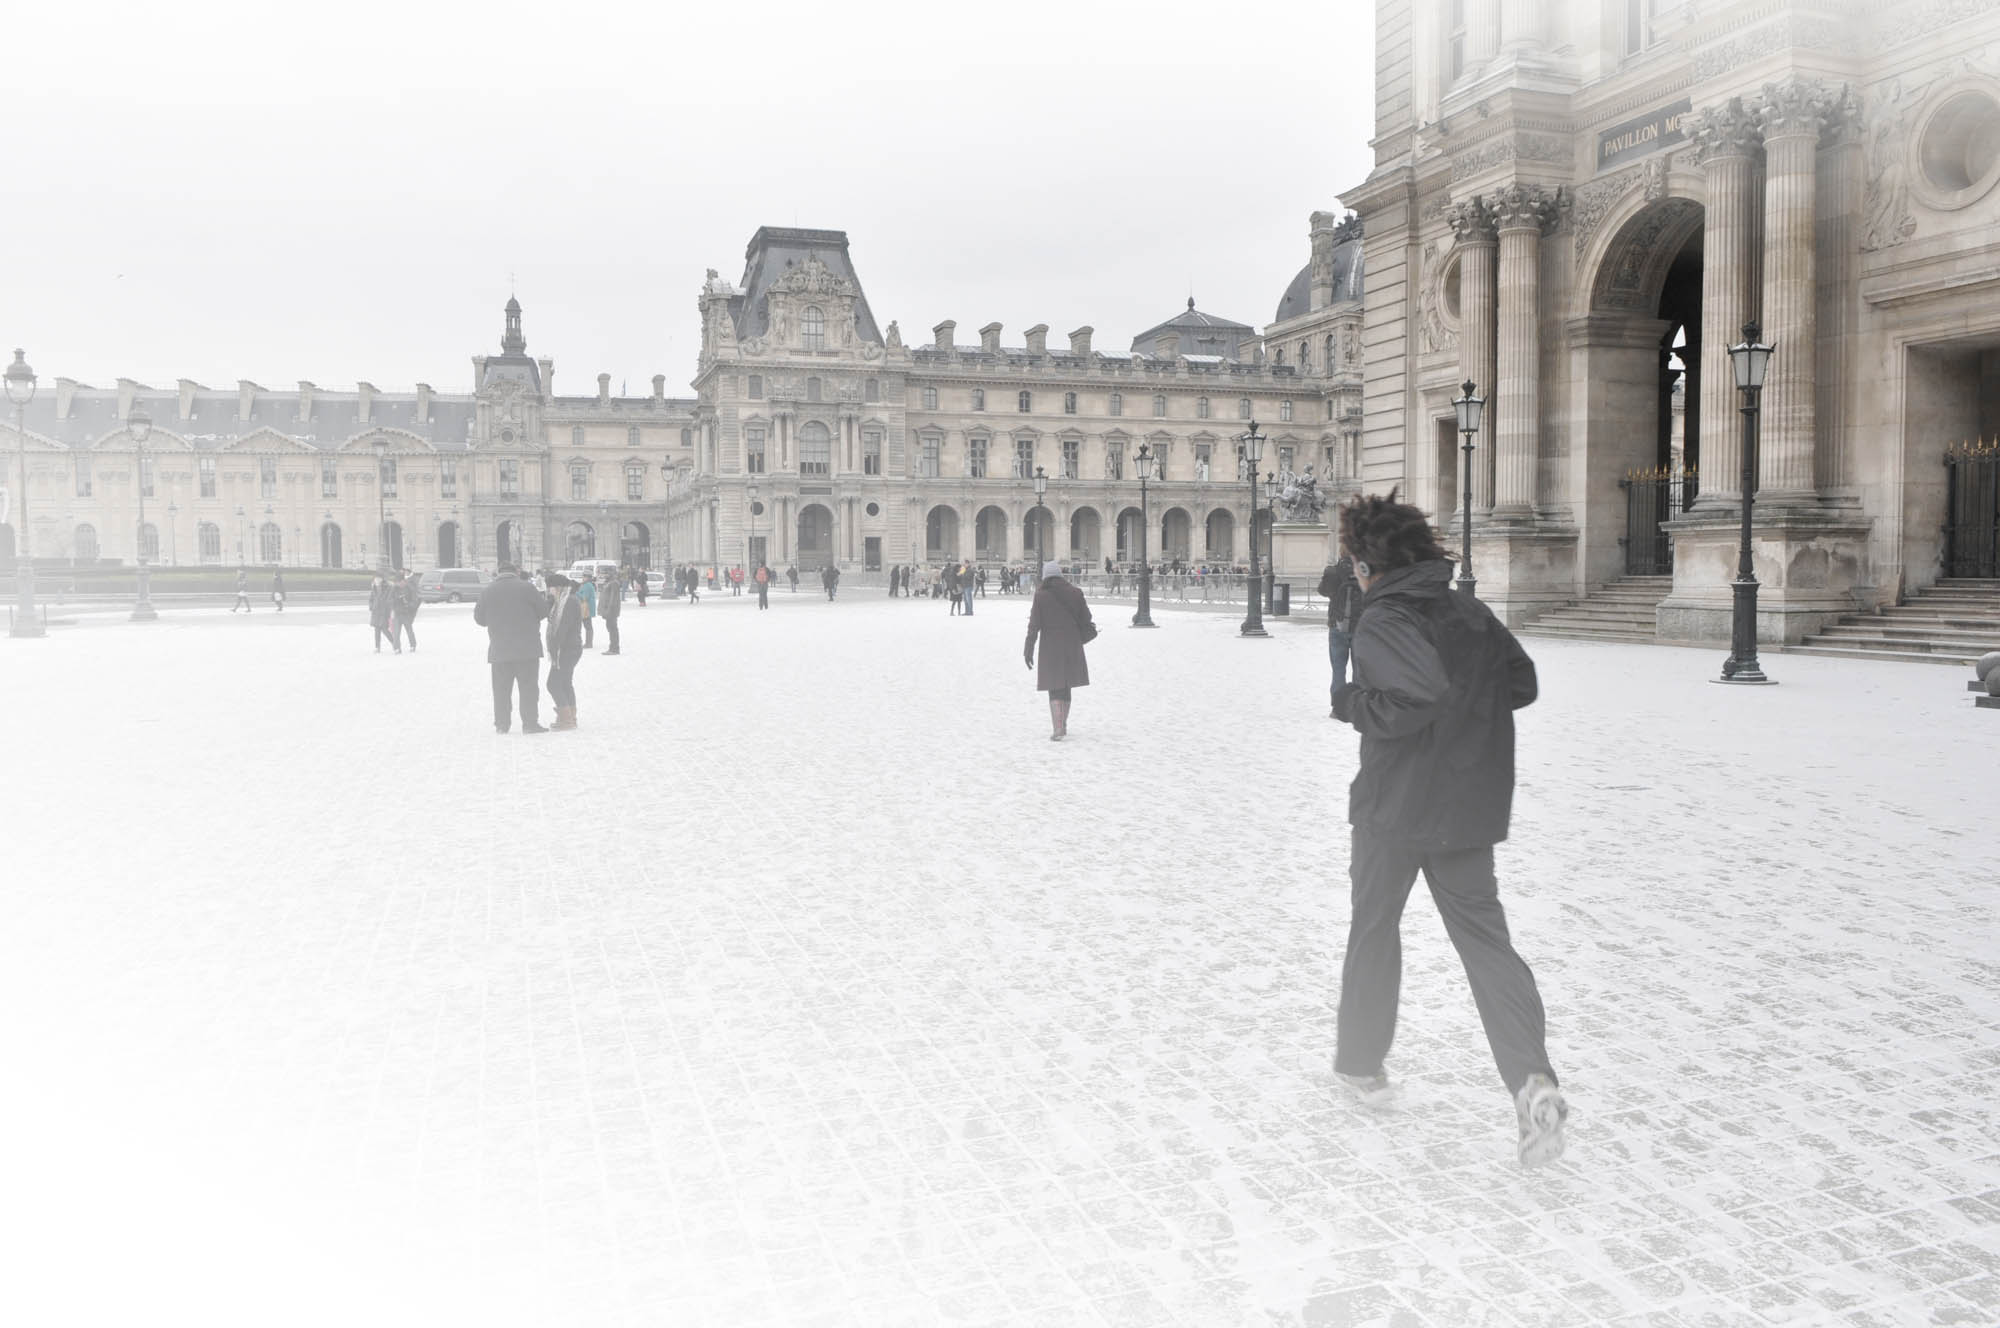 2012.02.05_12.57.06_5245(1)Louvre